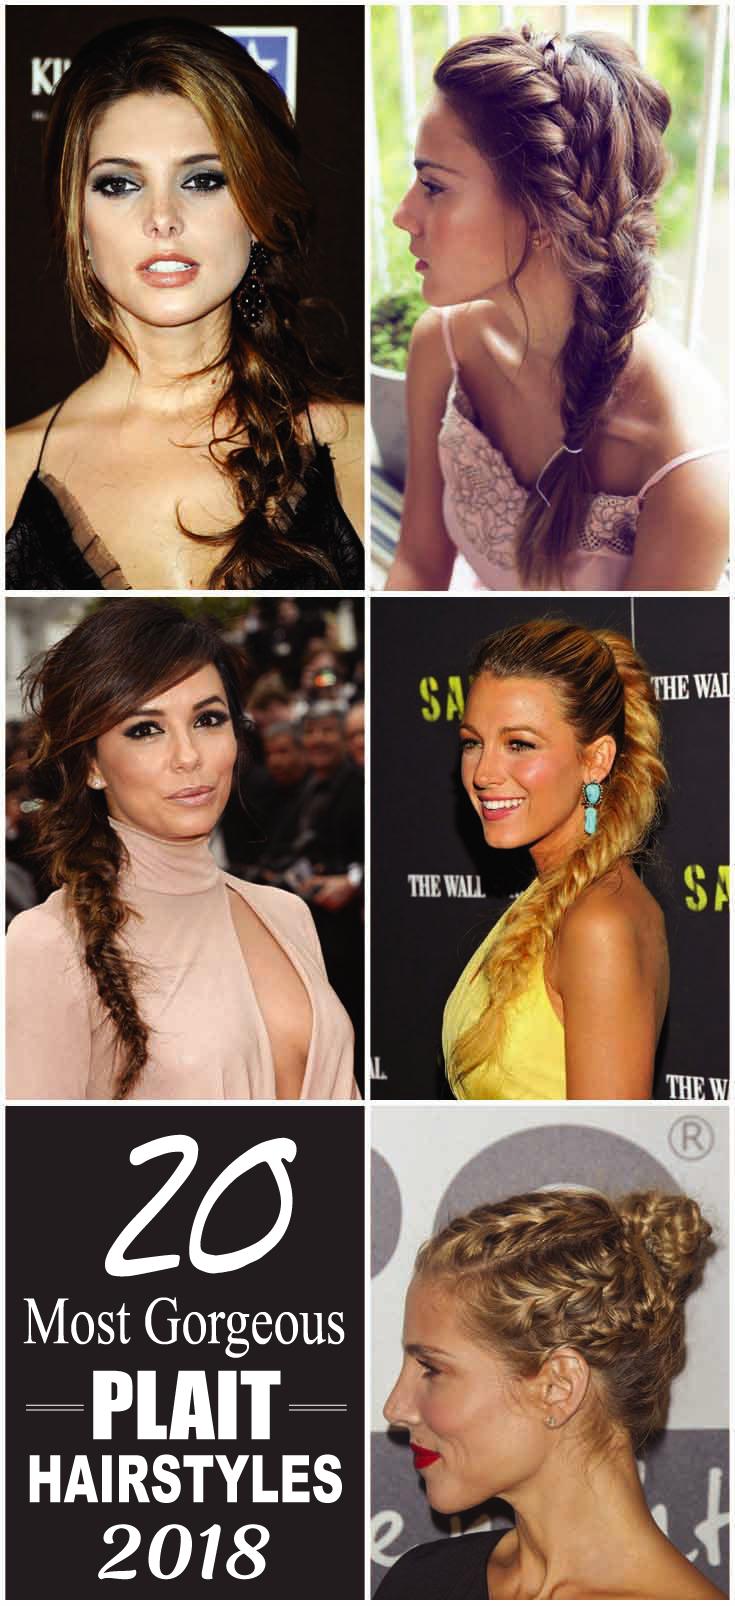 20 Most Gorgeous Plait Hairstyles 2018 Coisas Para Comprar